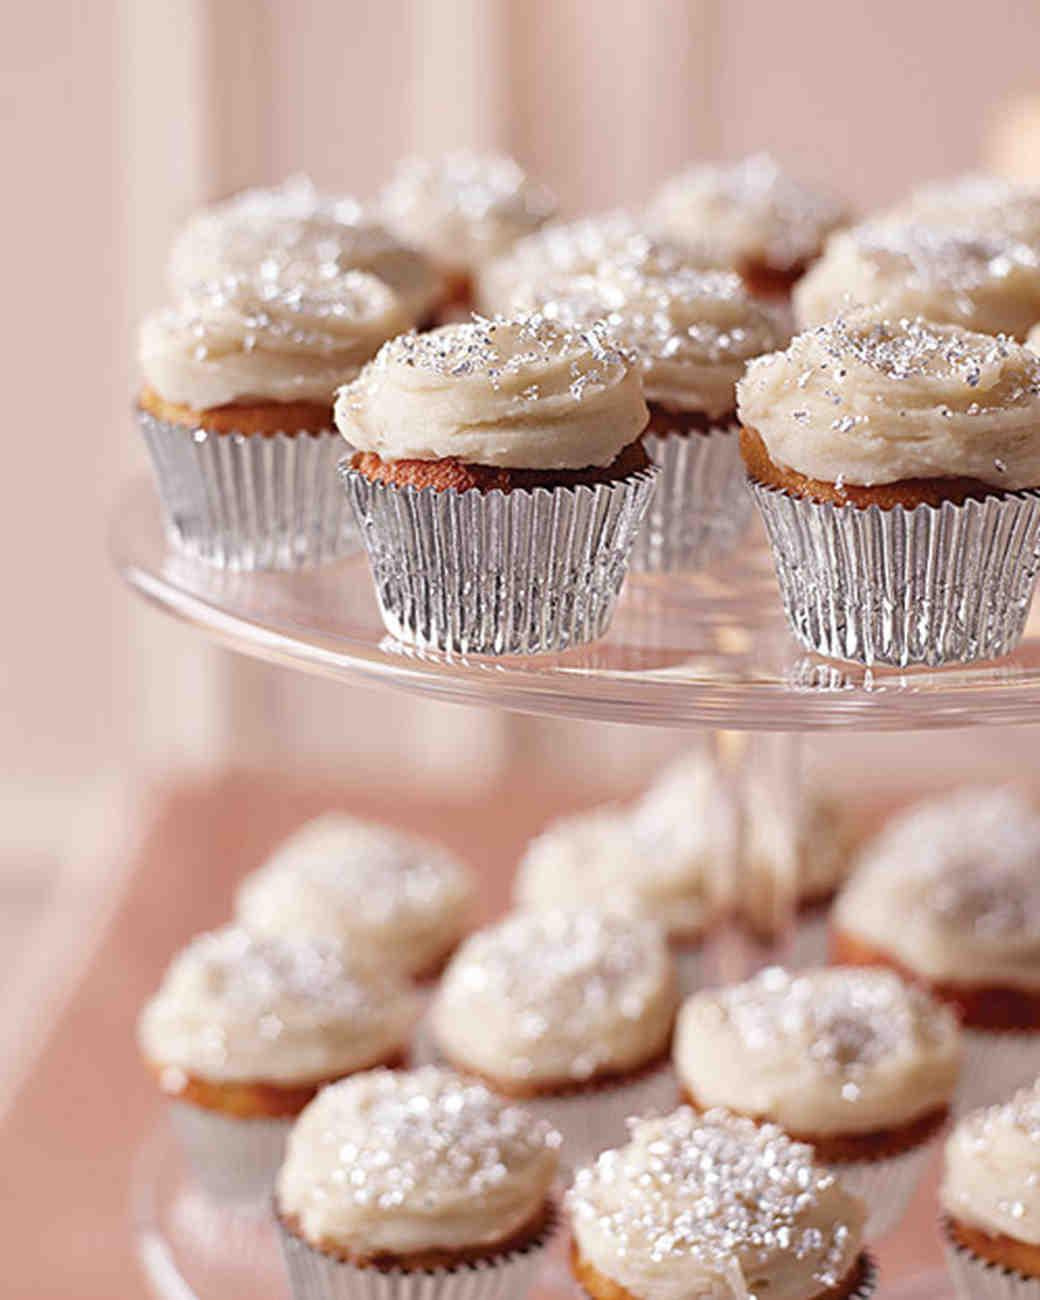 Yuzu-Vanilla Cupcakes